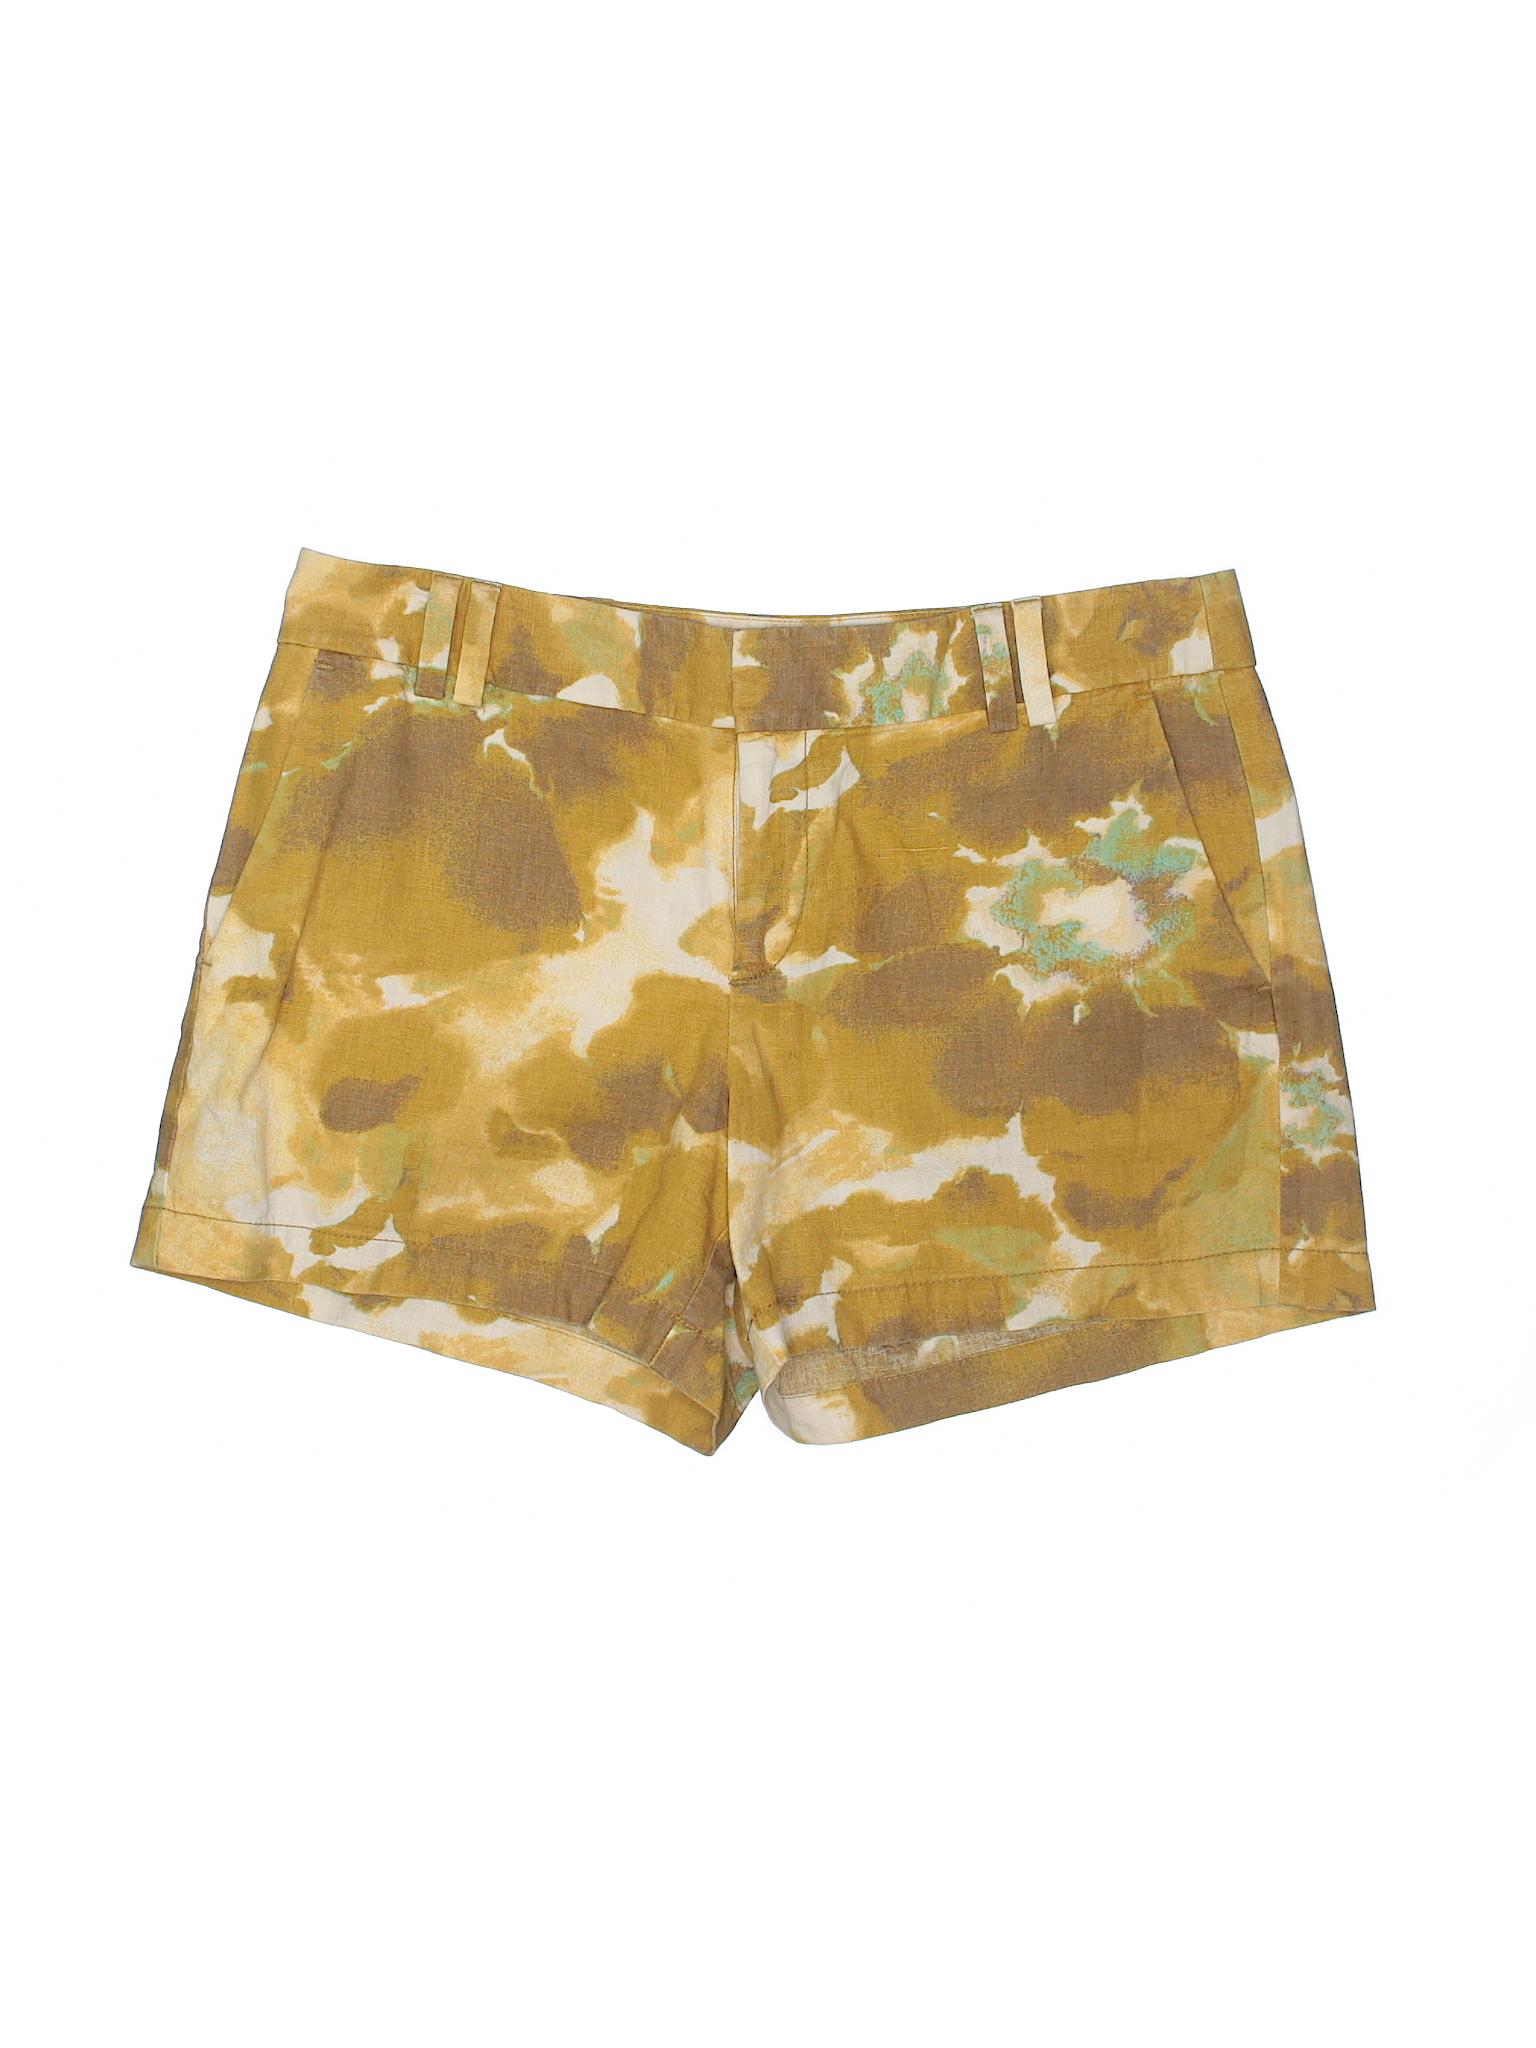 Boutique Shorts LOFT Taylor Khaki Ann ZxSpSqCBw